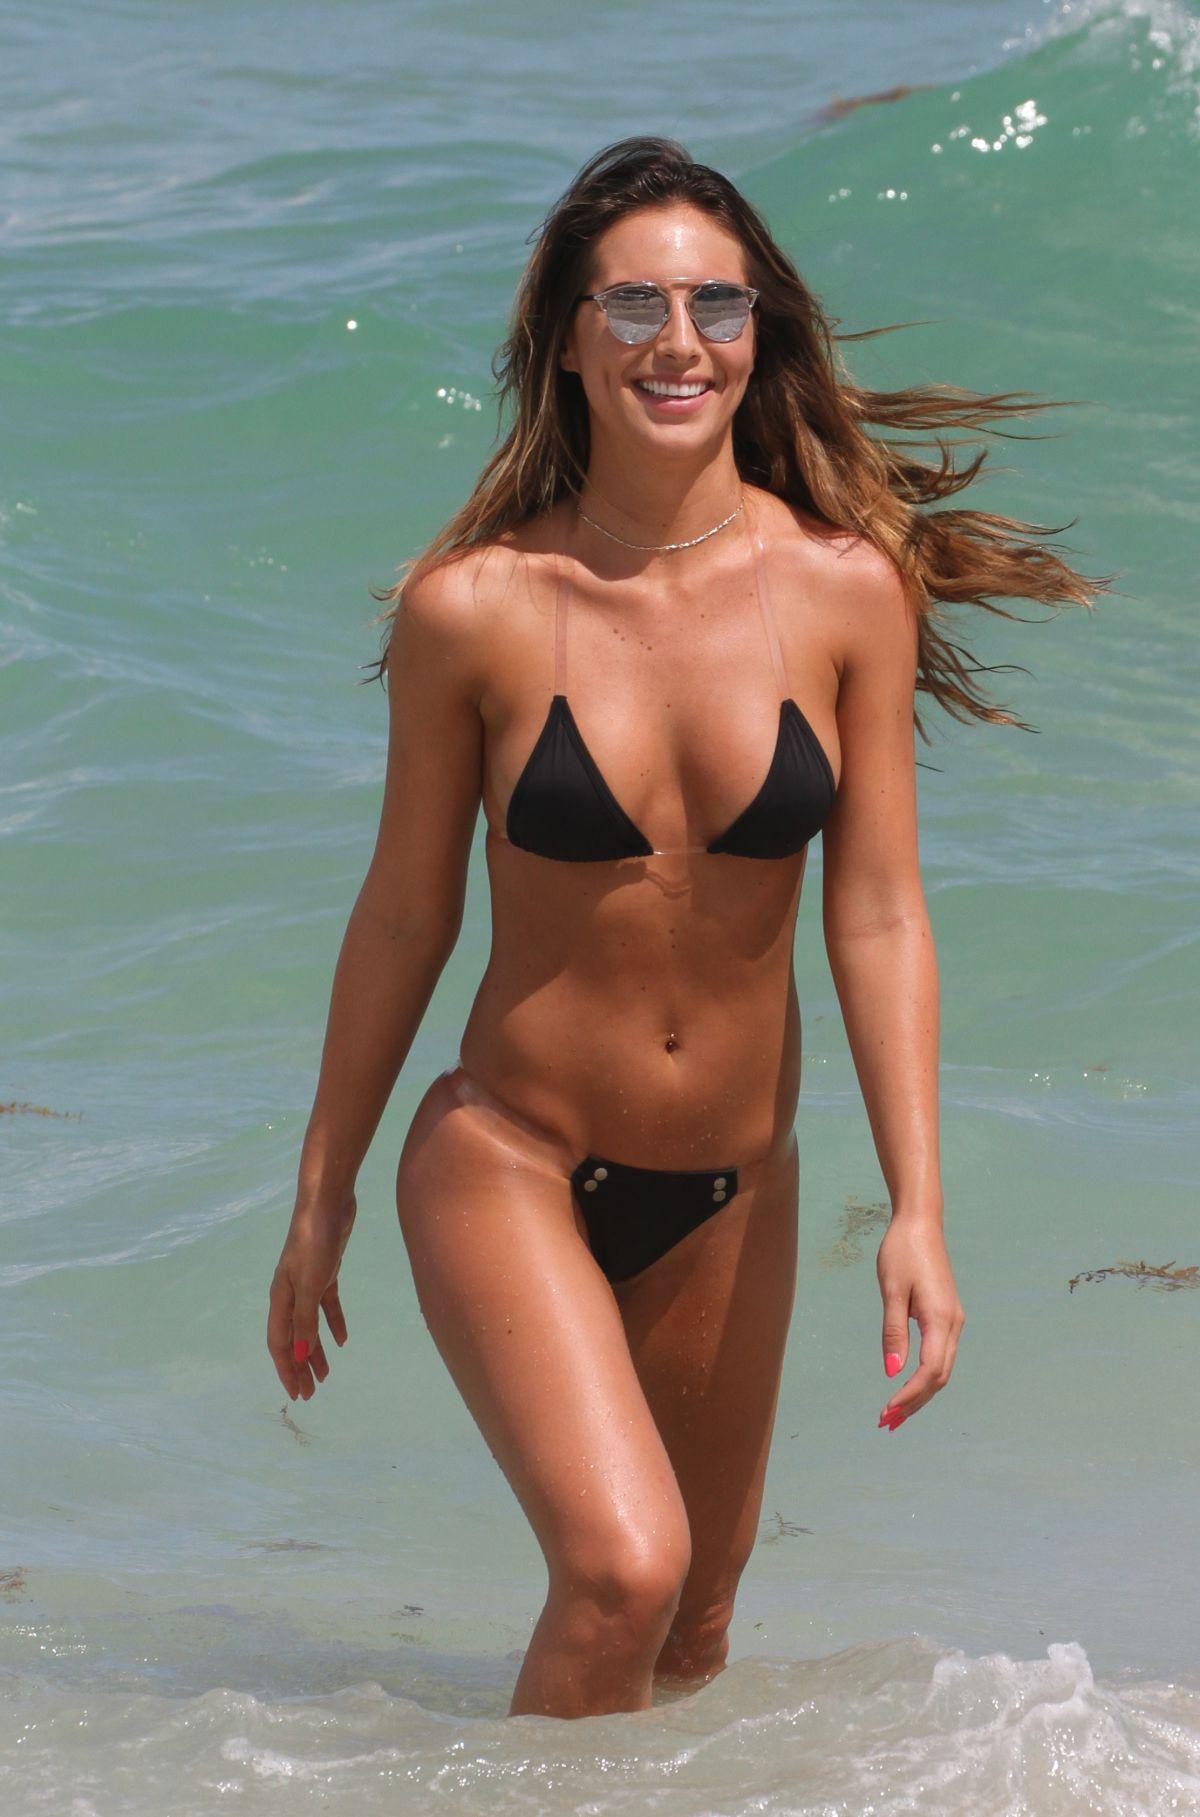 BRITTNY WARD in Bikini at a Beach in Miami 07/16/2016 - HawtCelebs ...